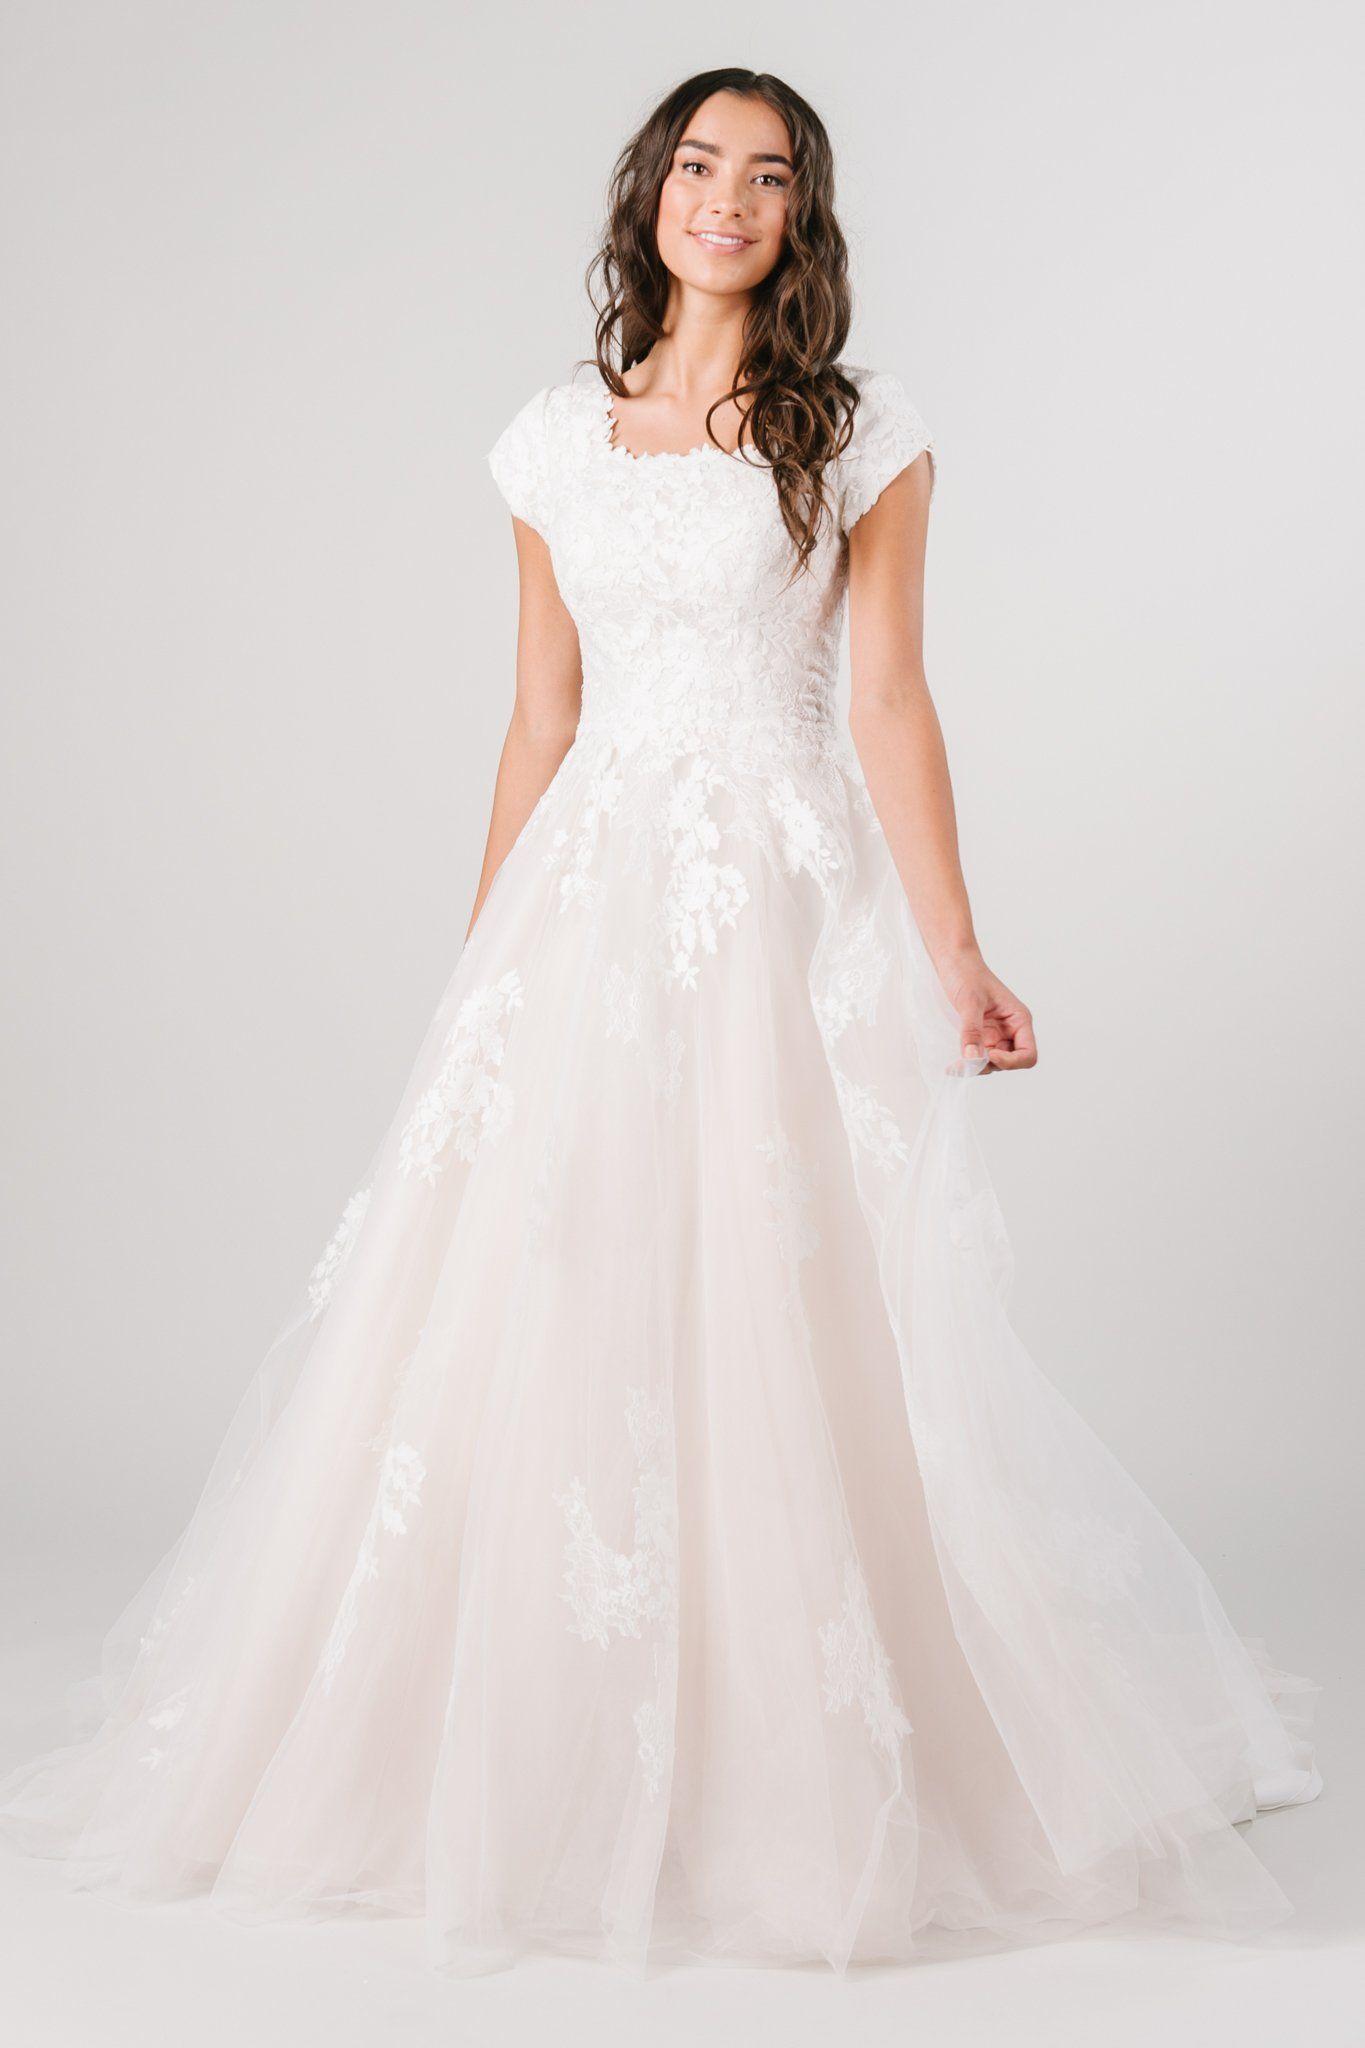 Alana in 2020 Modest wedding dresses ball gown, Dream